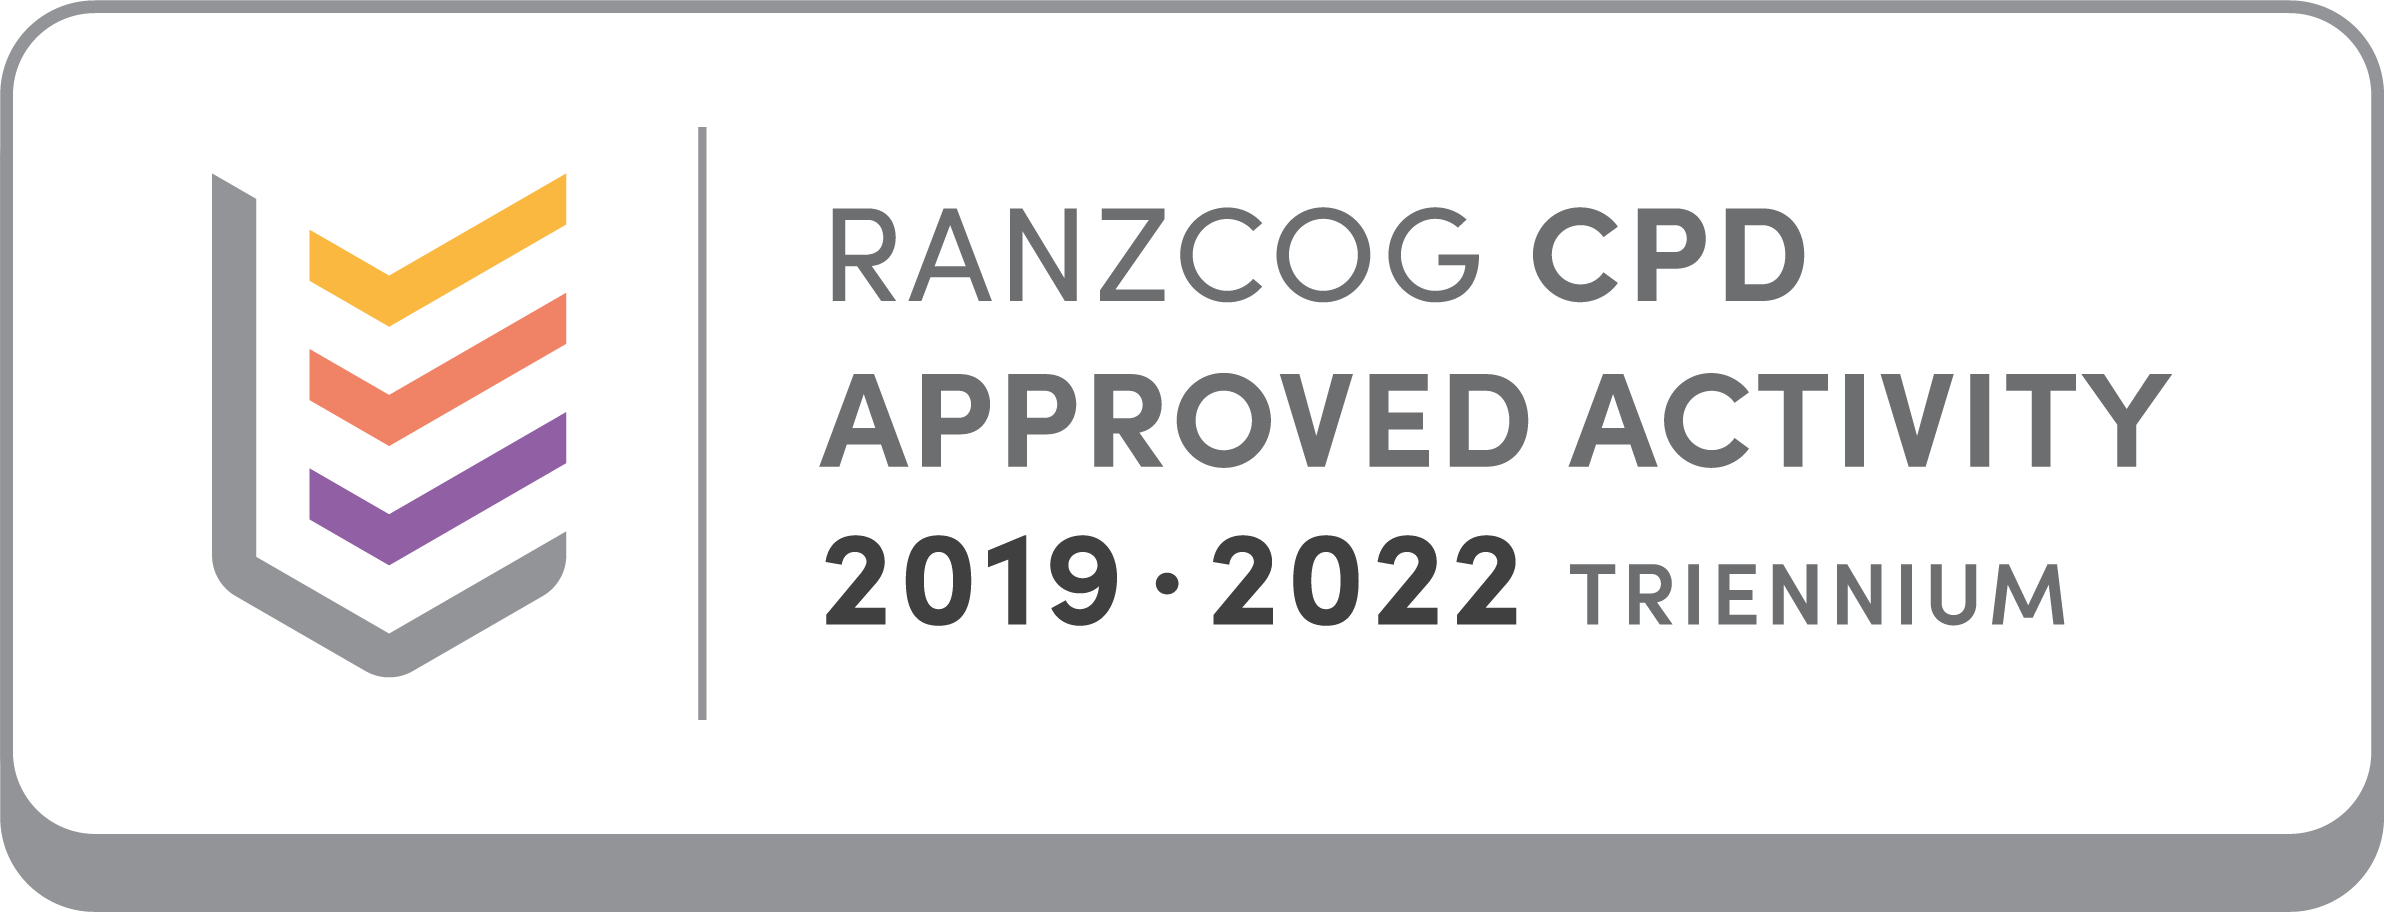 RANZCOG approved activity 2019-2022 triennium